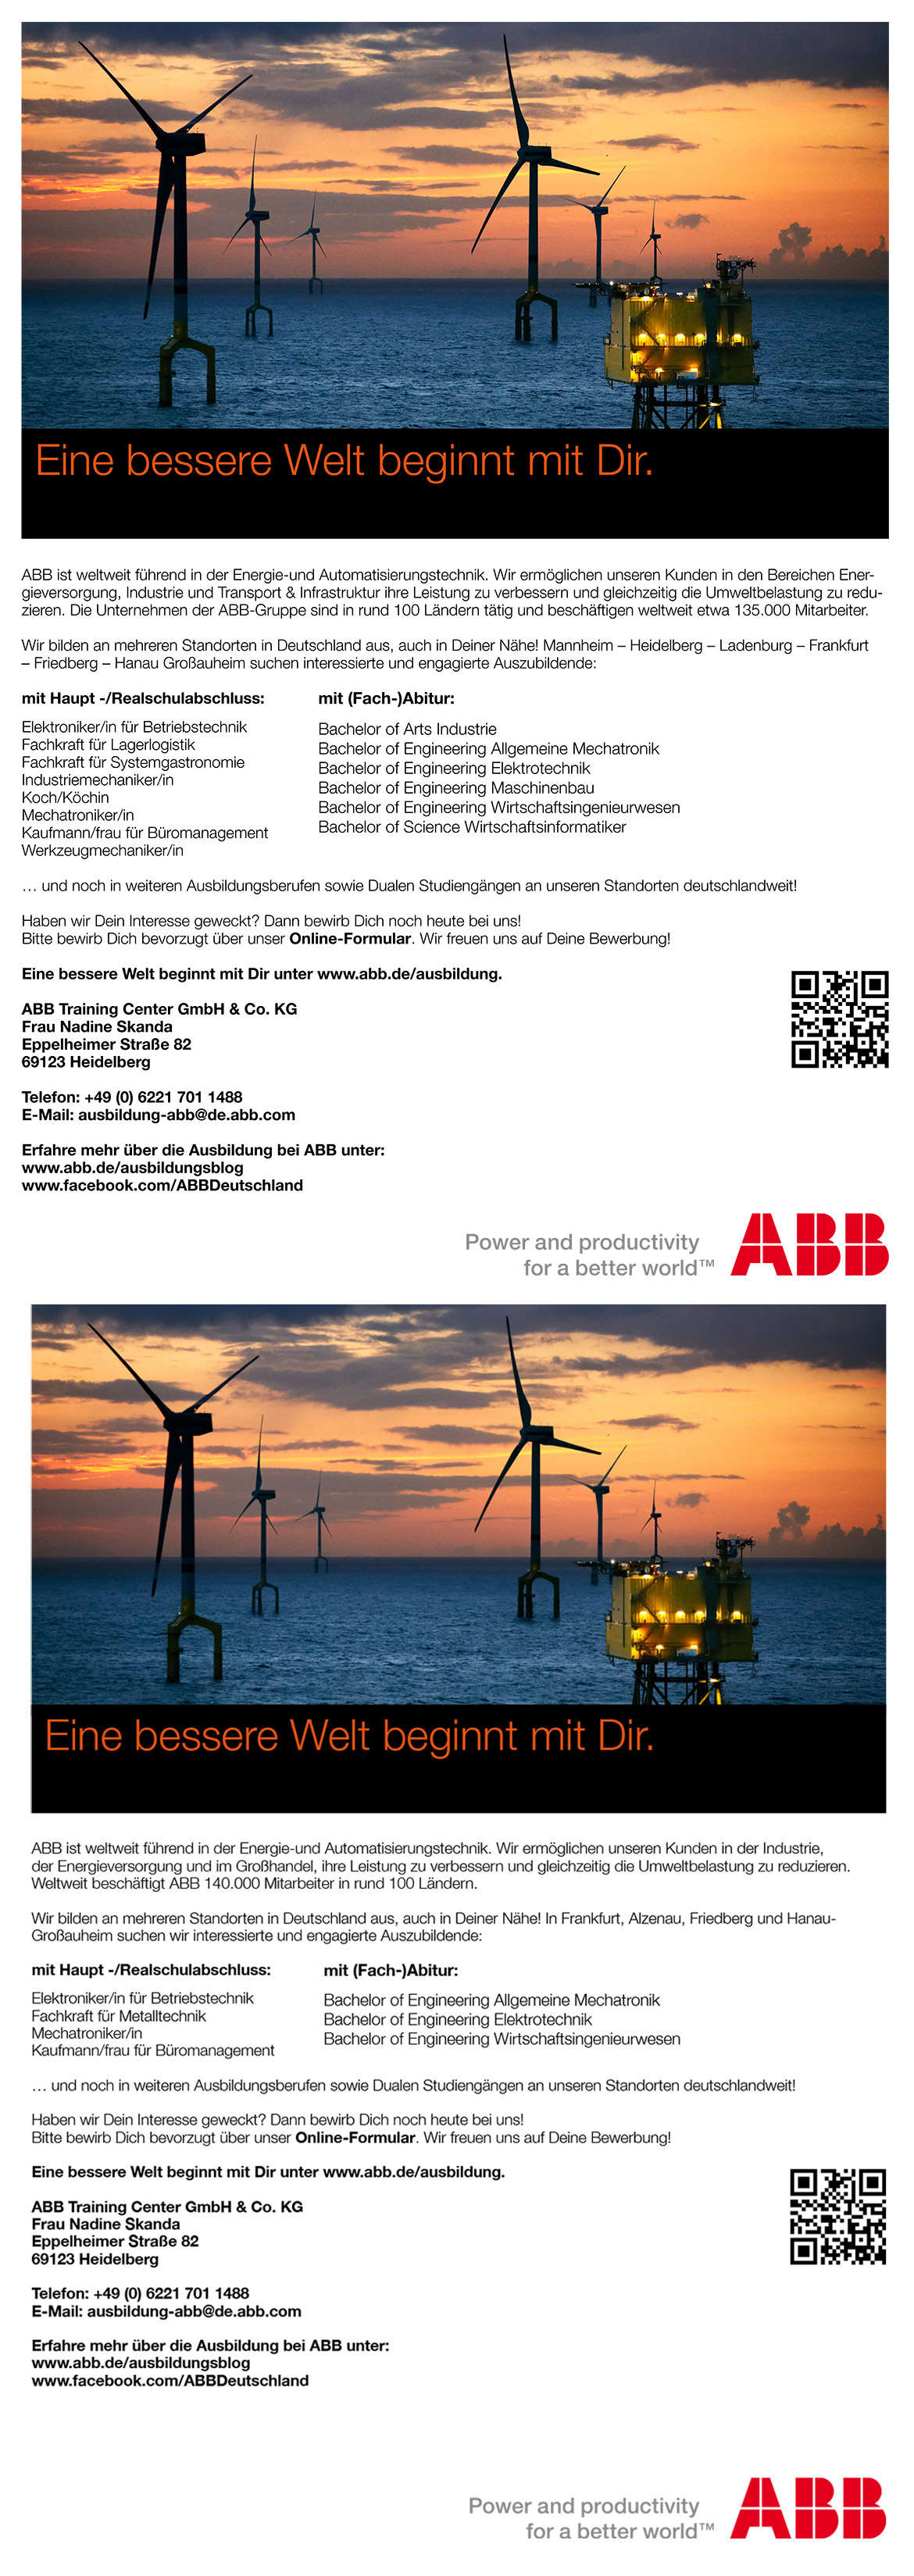 Ausbildungsplakat: ABB Training Center GmbH & Co. KG